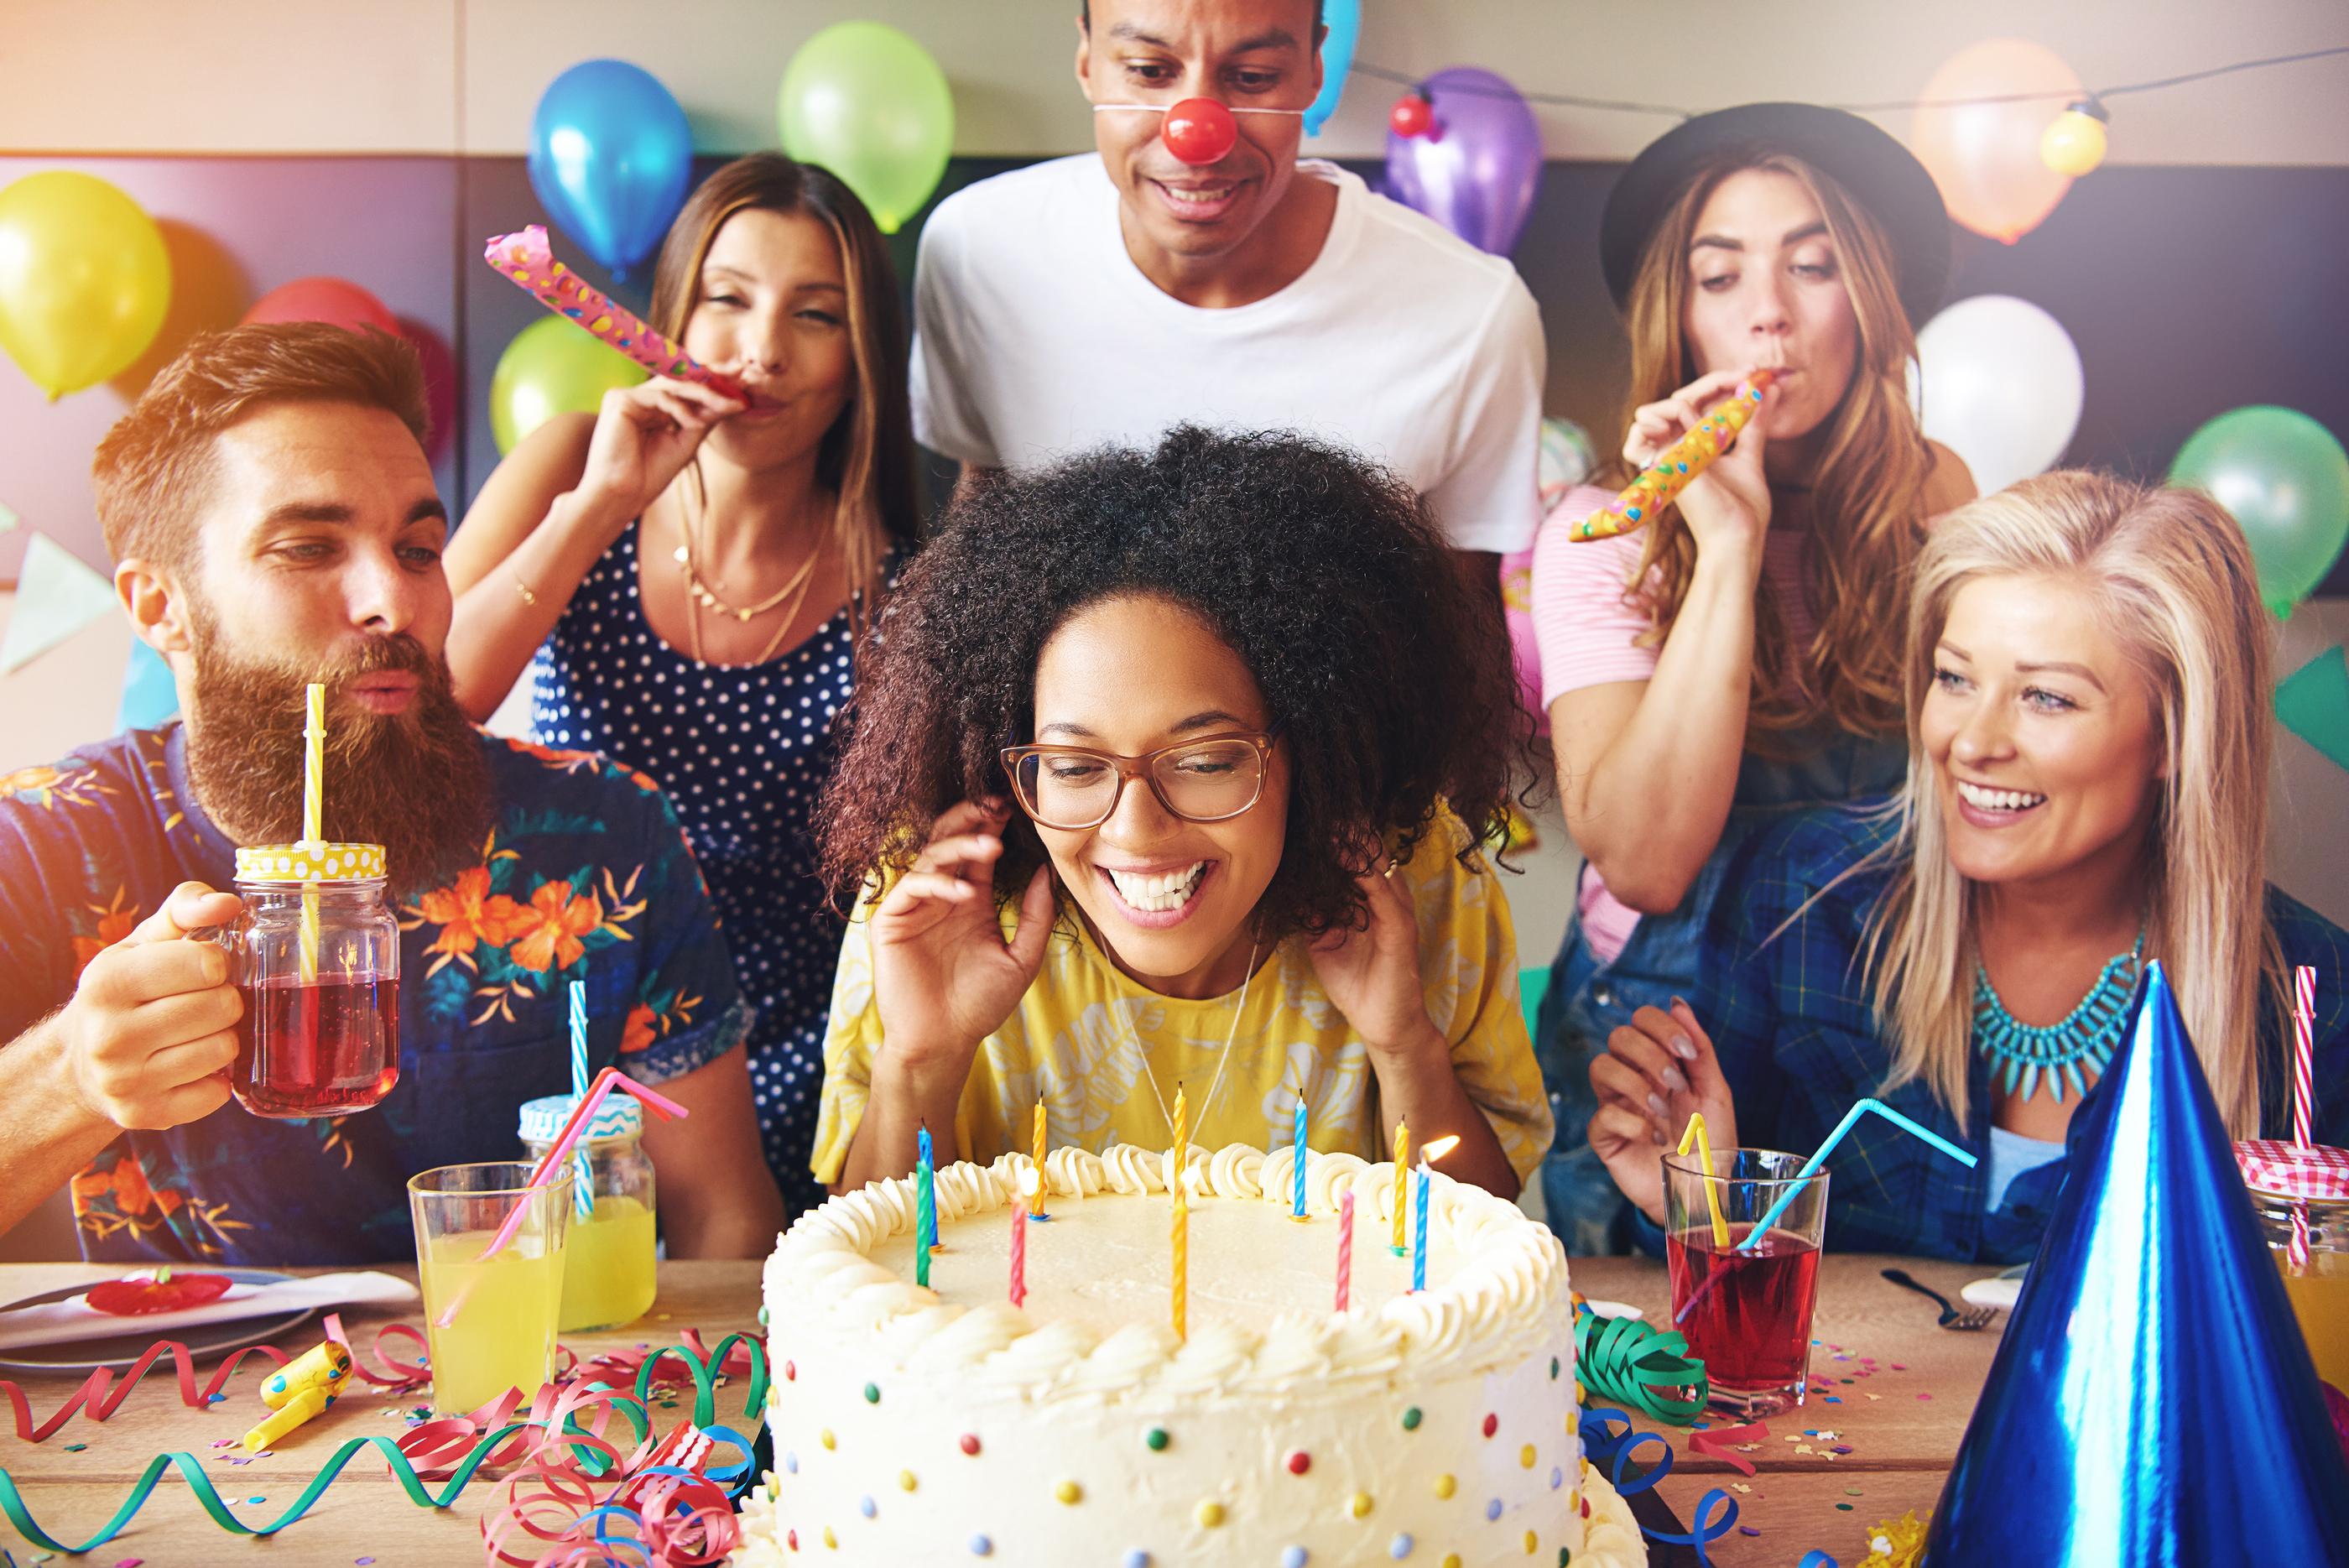 Happy People Celebrate Everything